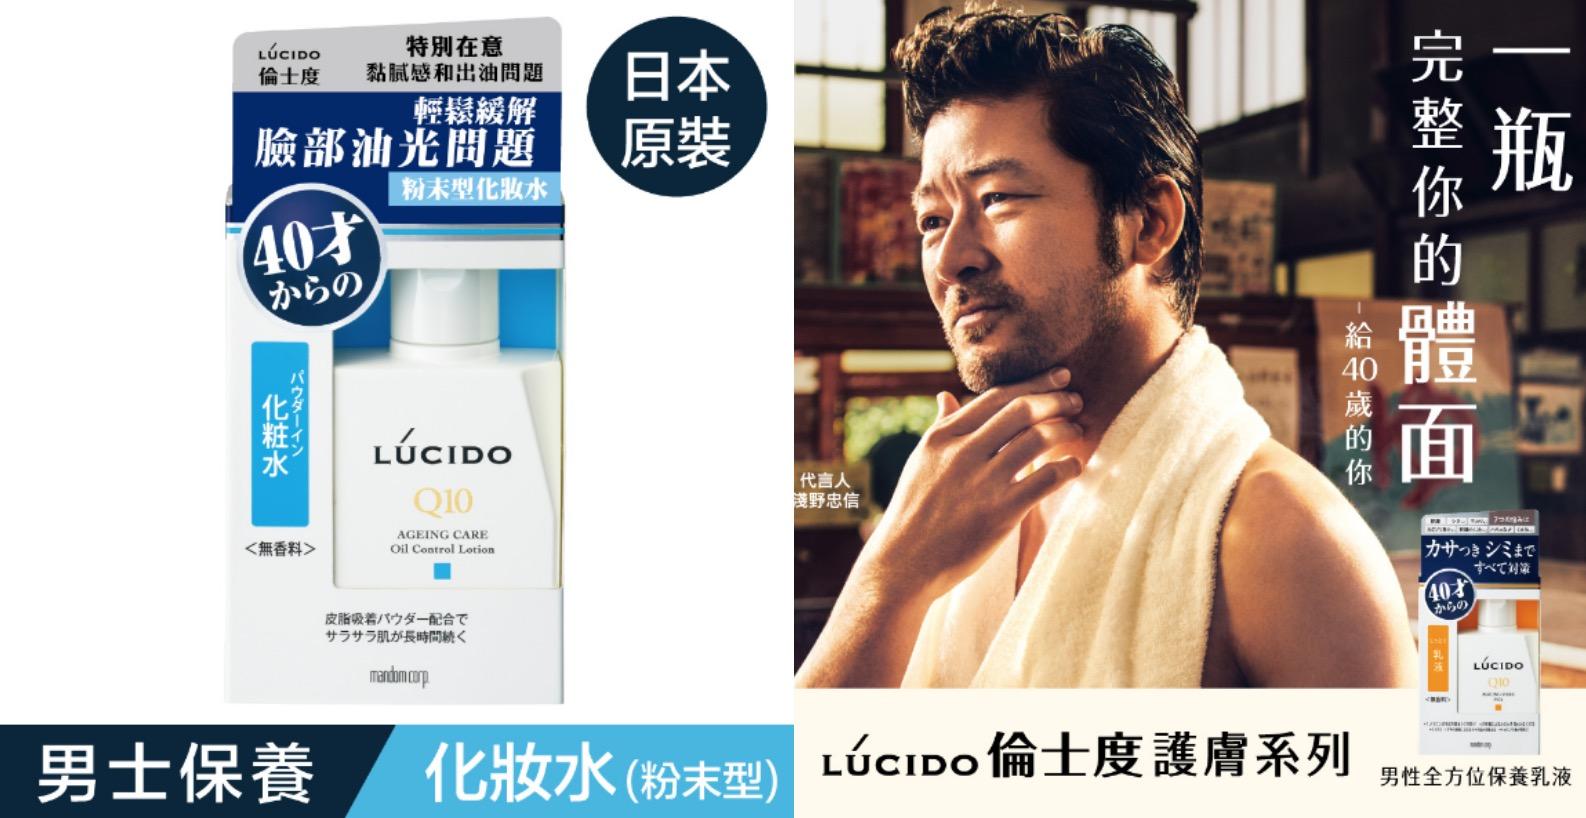 LUCIDO倫士度是為成熟男士量身打造的全方位保養品,產品主打無合成香料、無人工色素、無防腐劑,能解決隨著年齡增長而在意的過度出油問題,這瓶粉末型化妝水能幫助吸收黏膩的油脂,使肌膚長時間保持清爽。